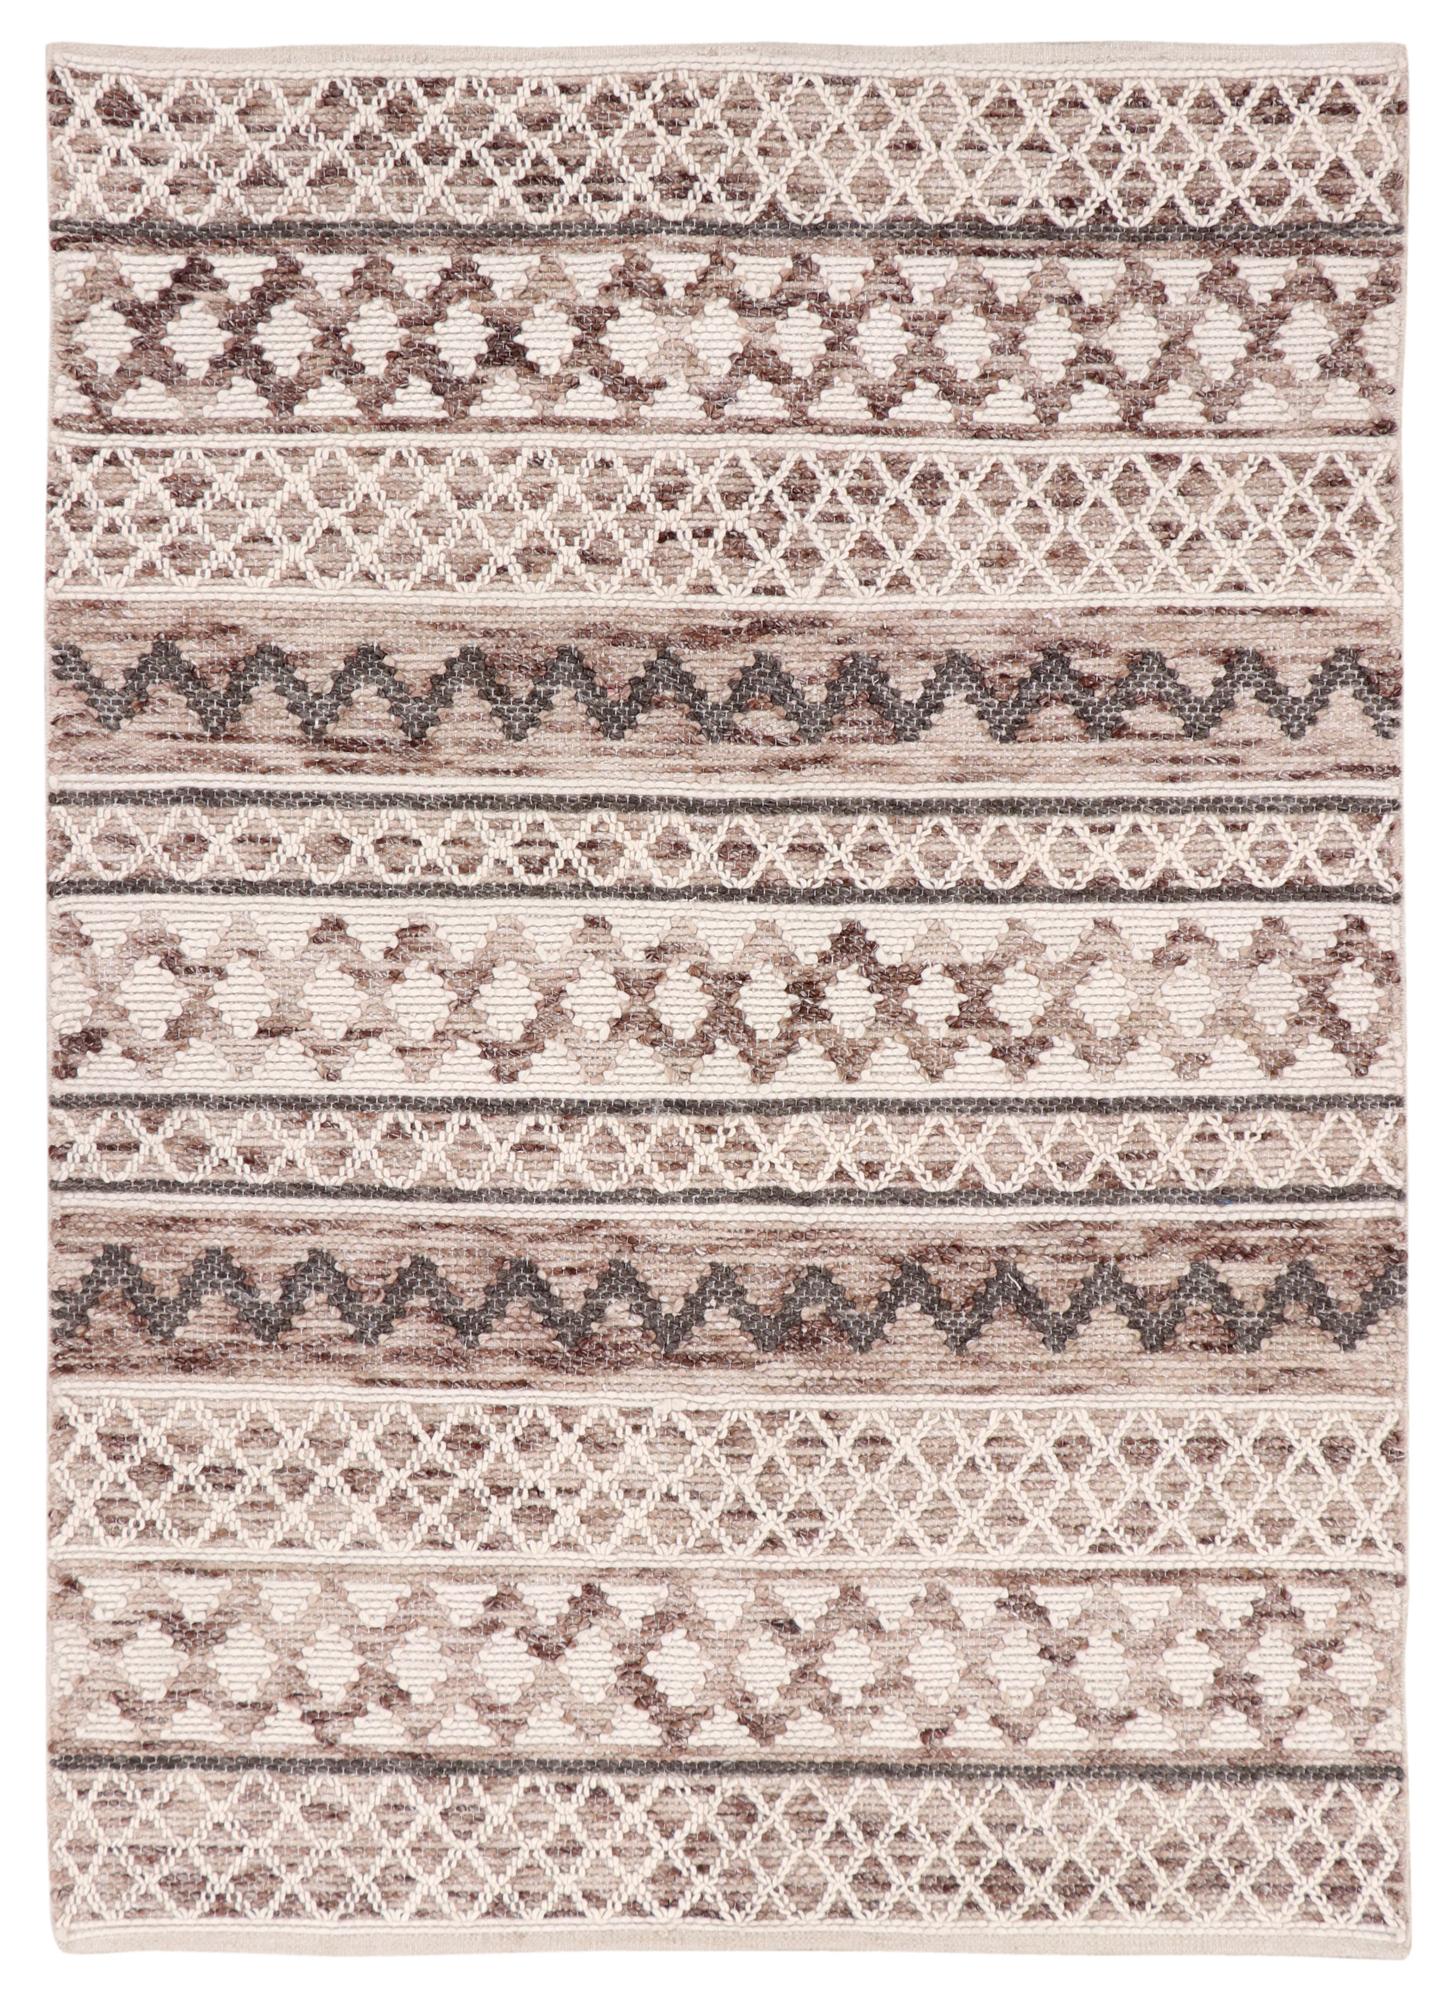 Natural Omen Woven Wool Rug